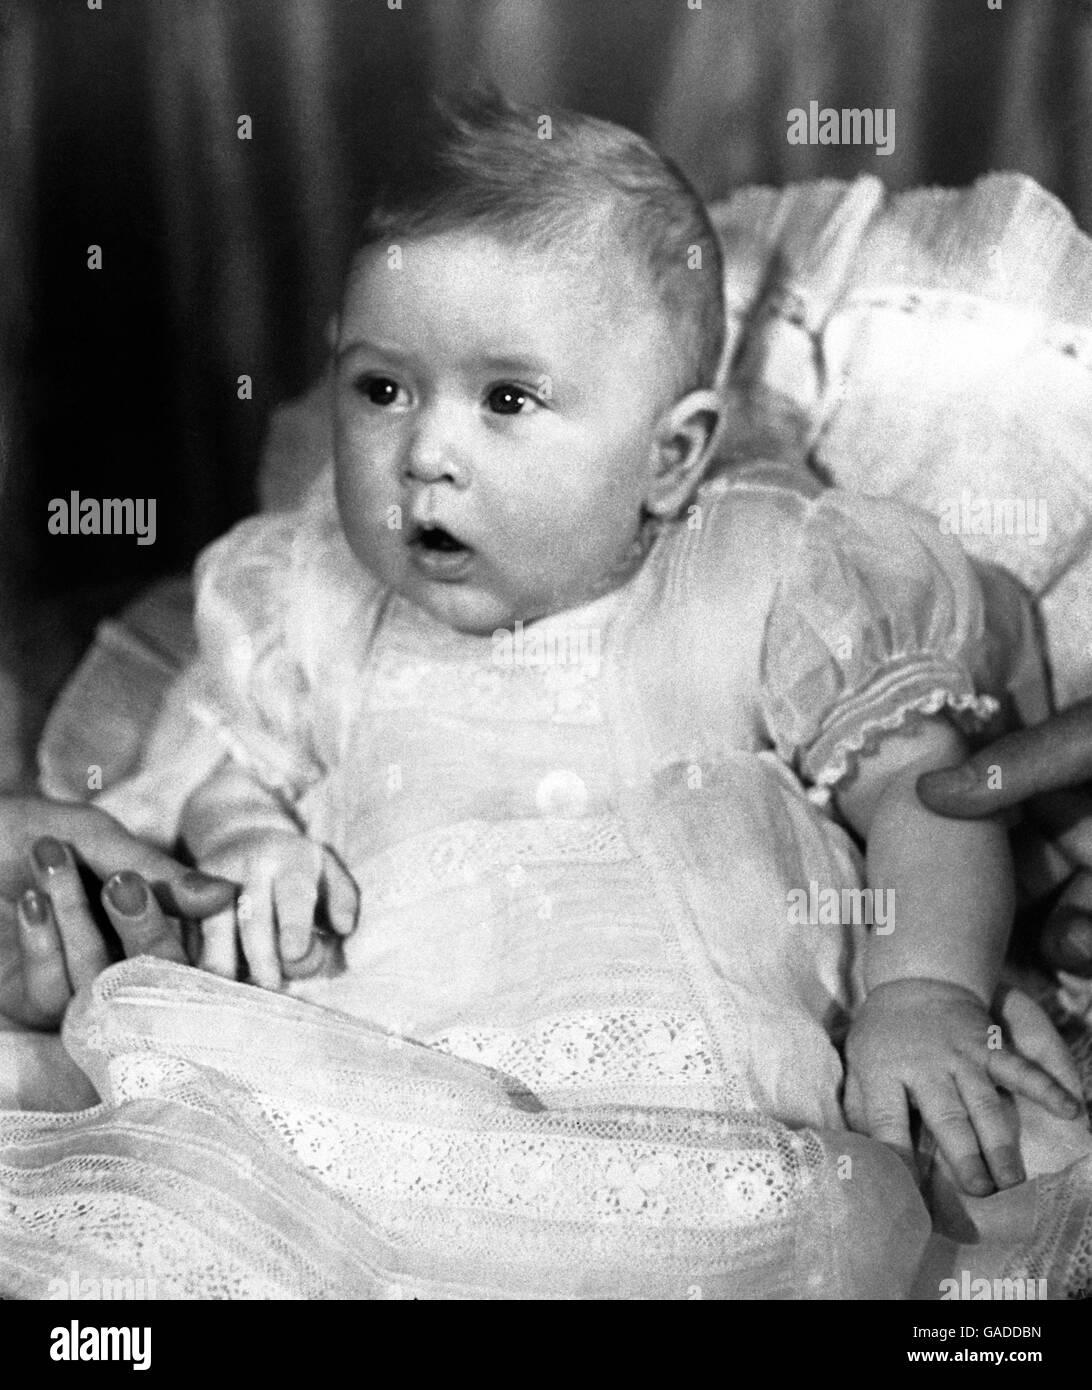 Royalty - Prince Charles - Stock Image